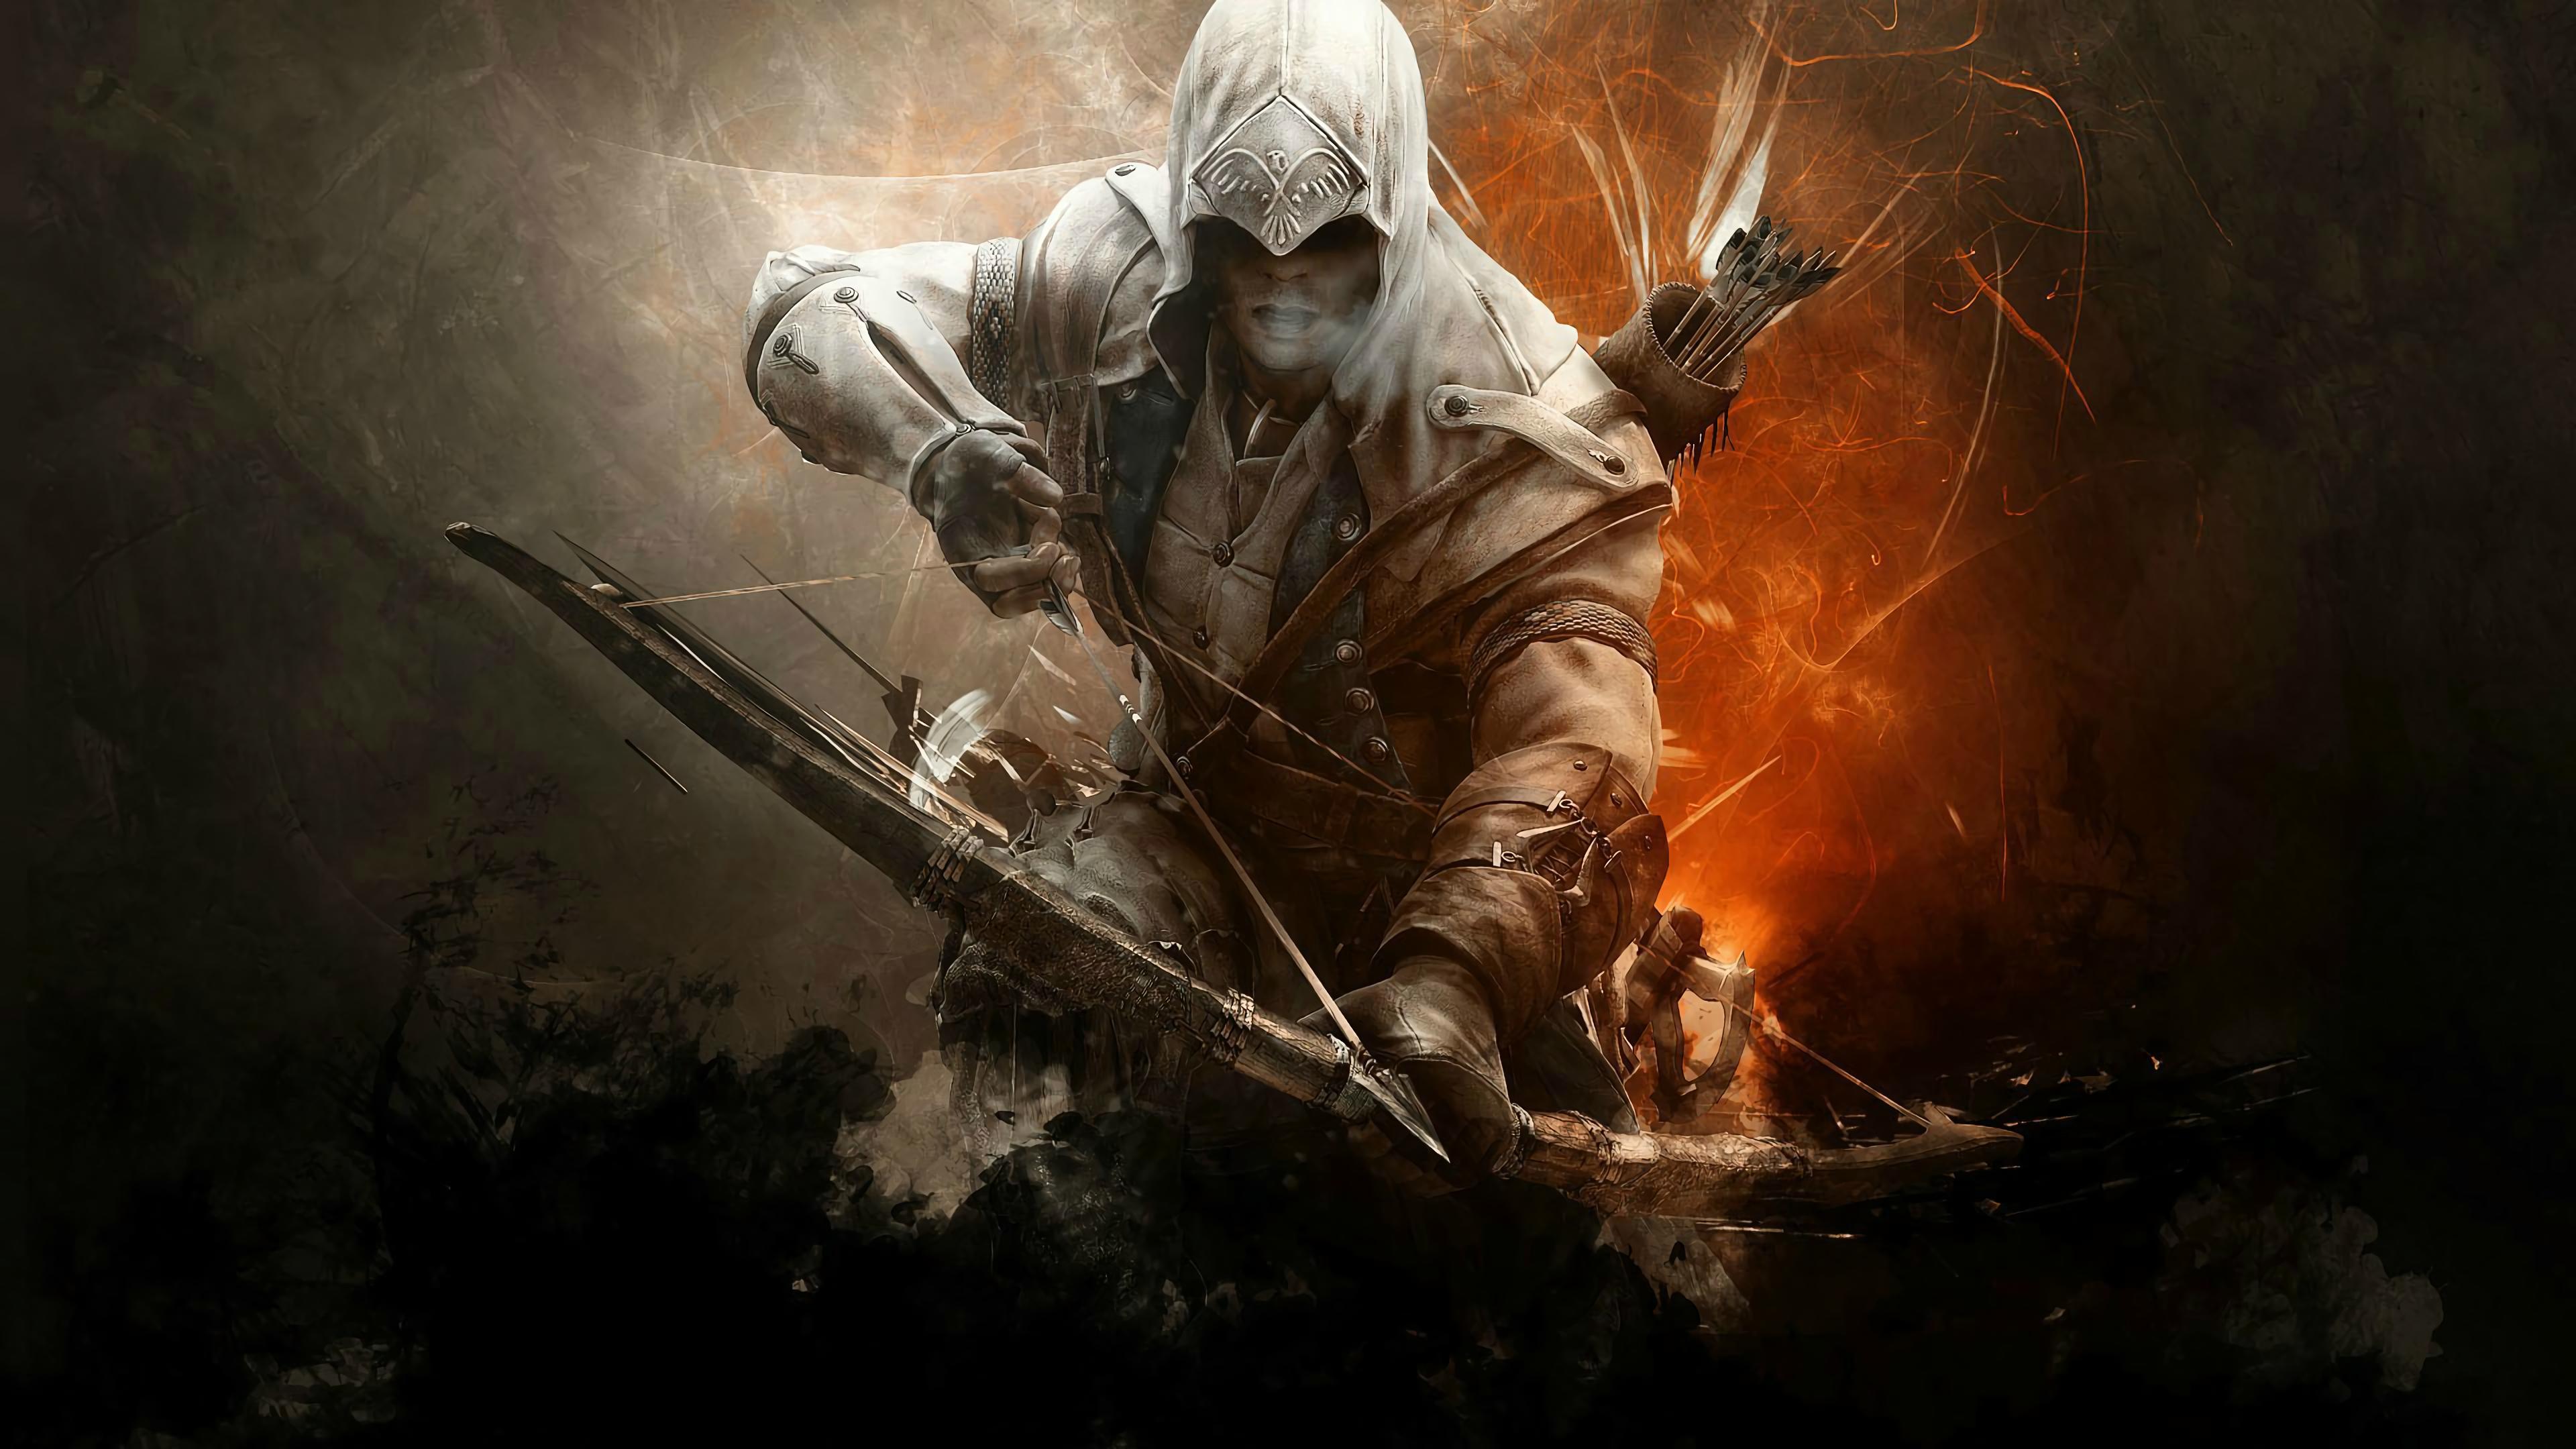 Assassins Creed III Conner Kenway